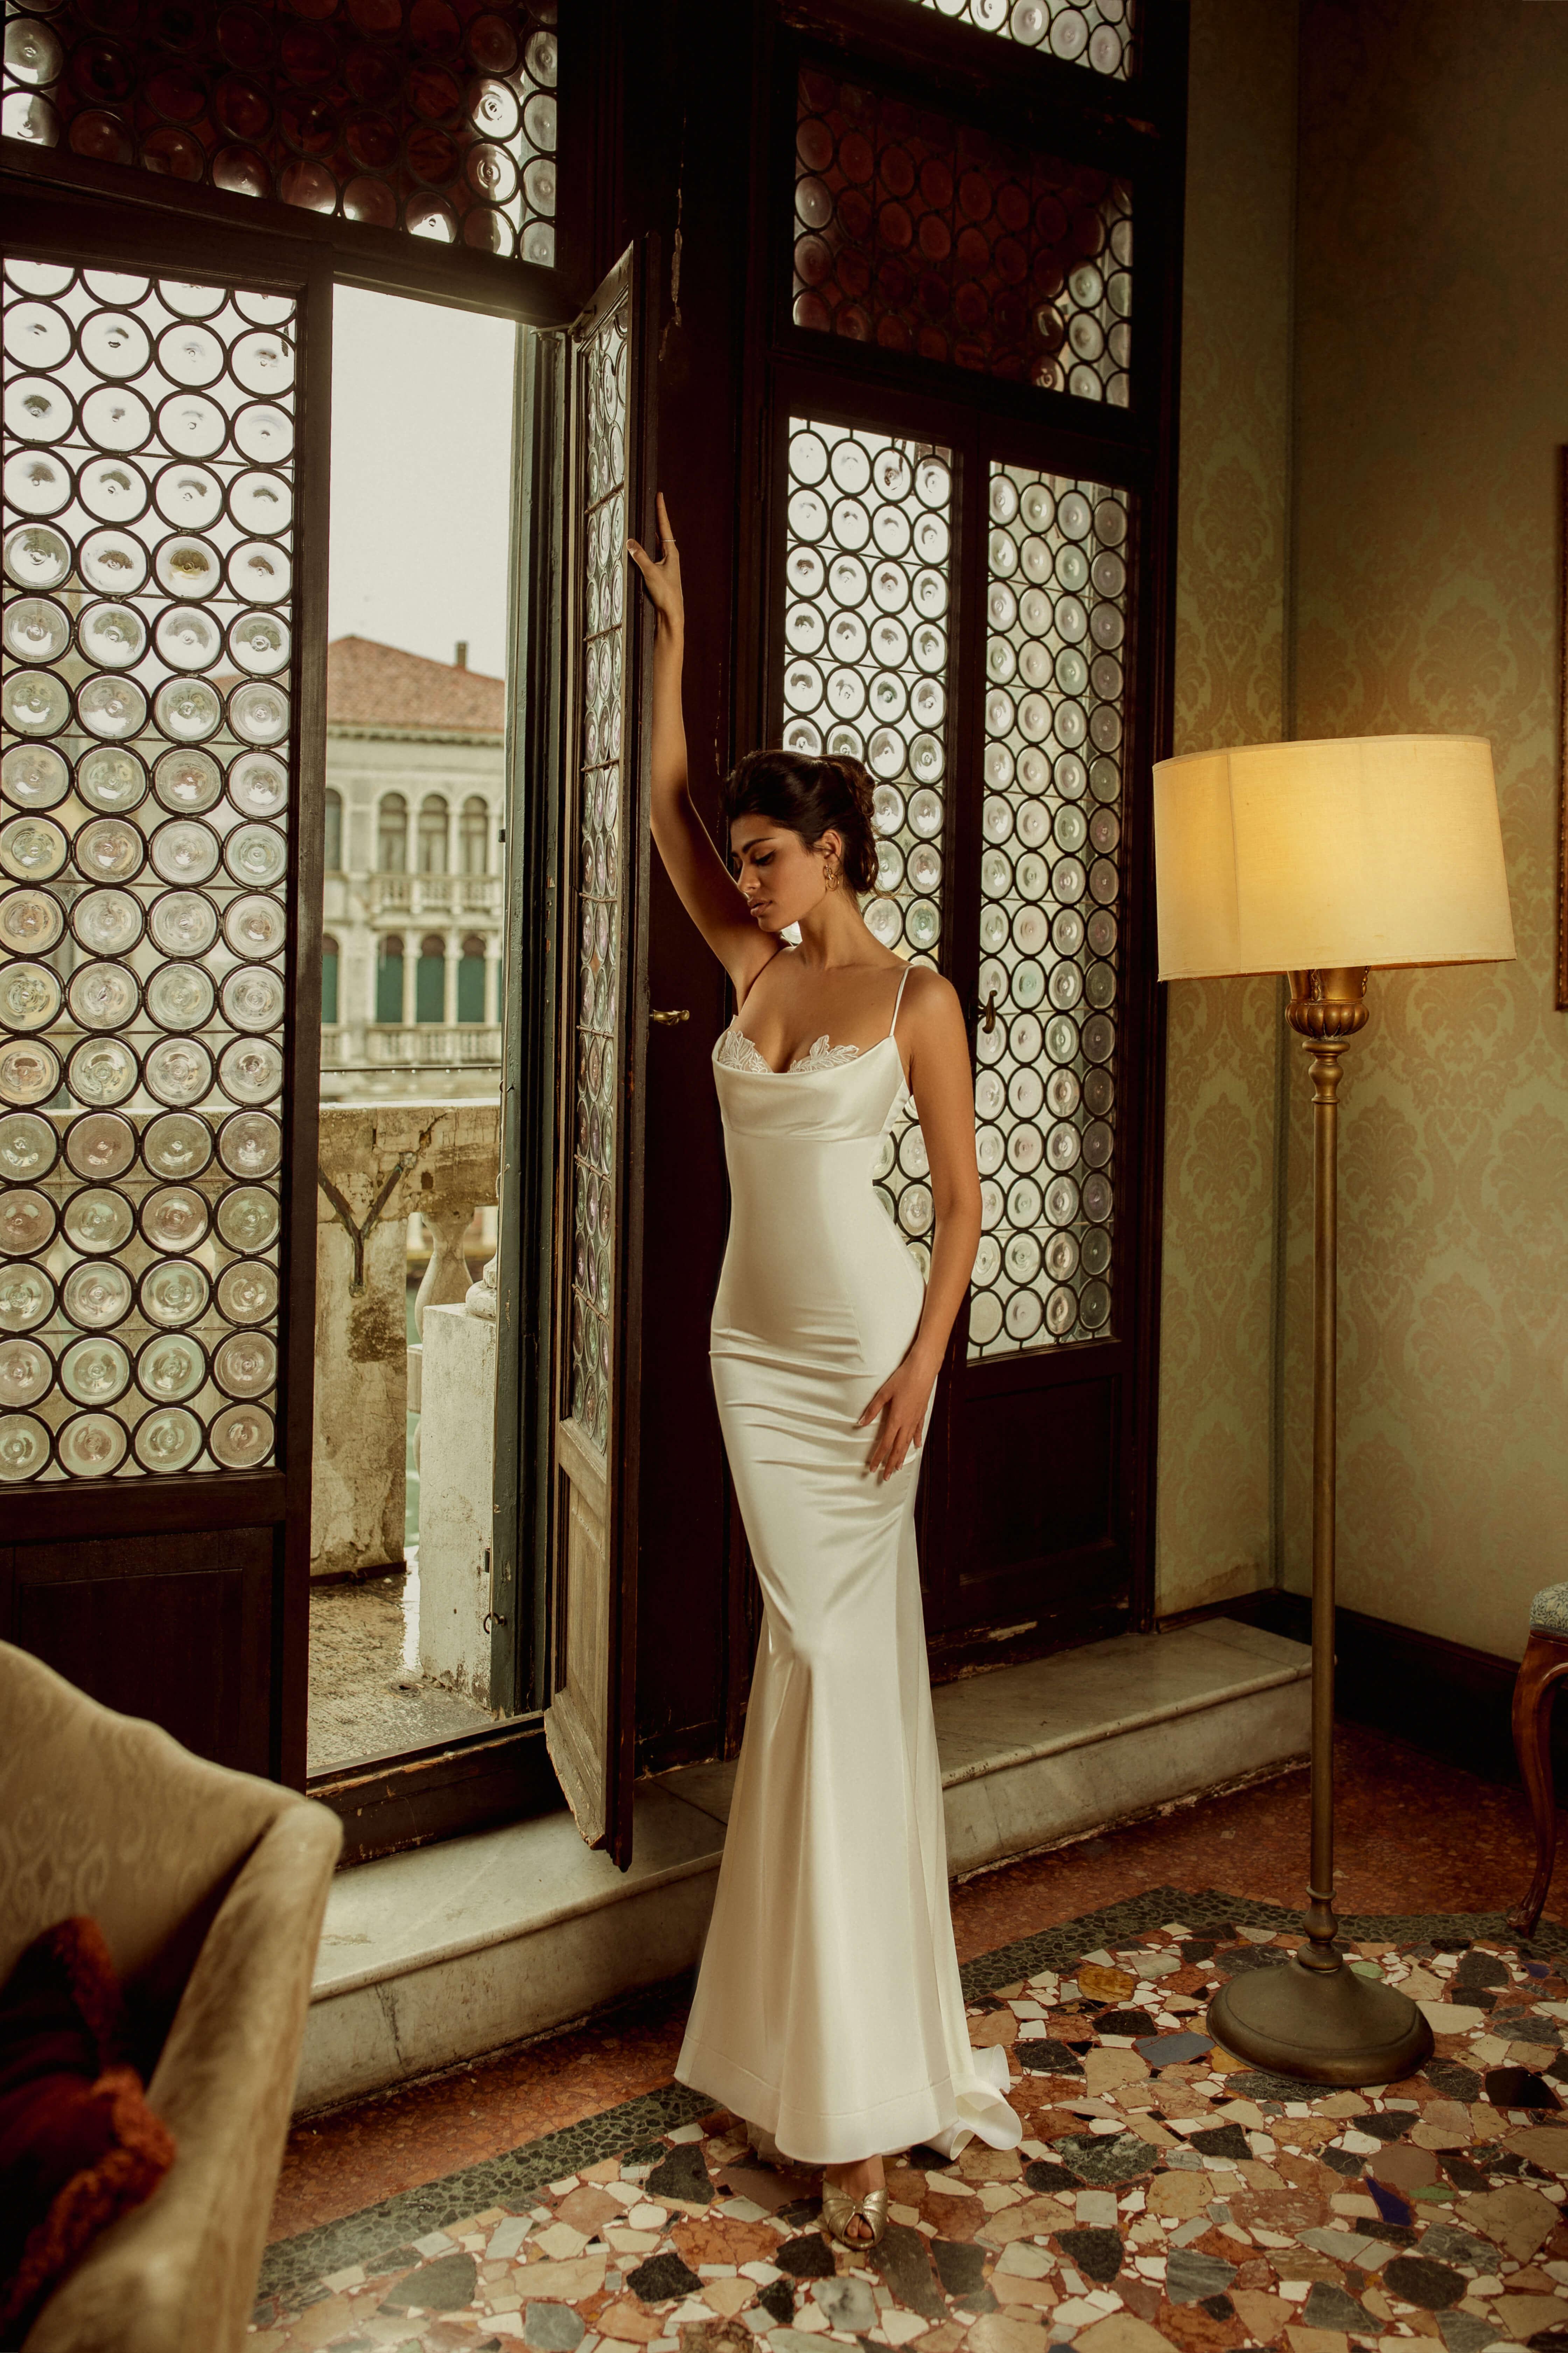 buy a wedding dress Fey Kiev Rara Avis